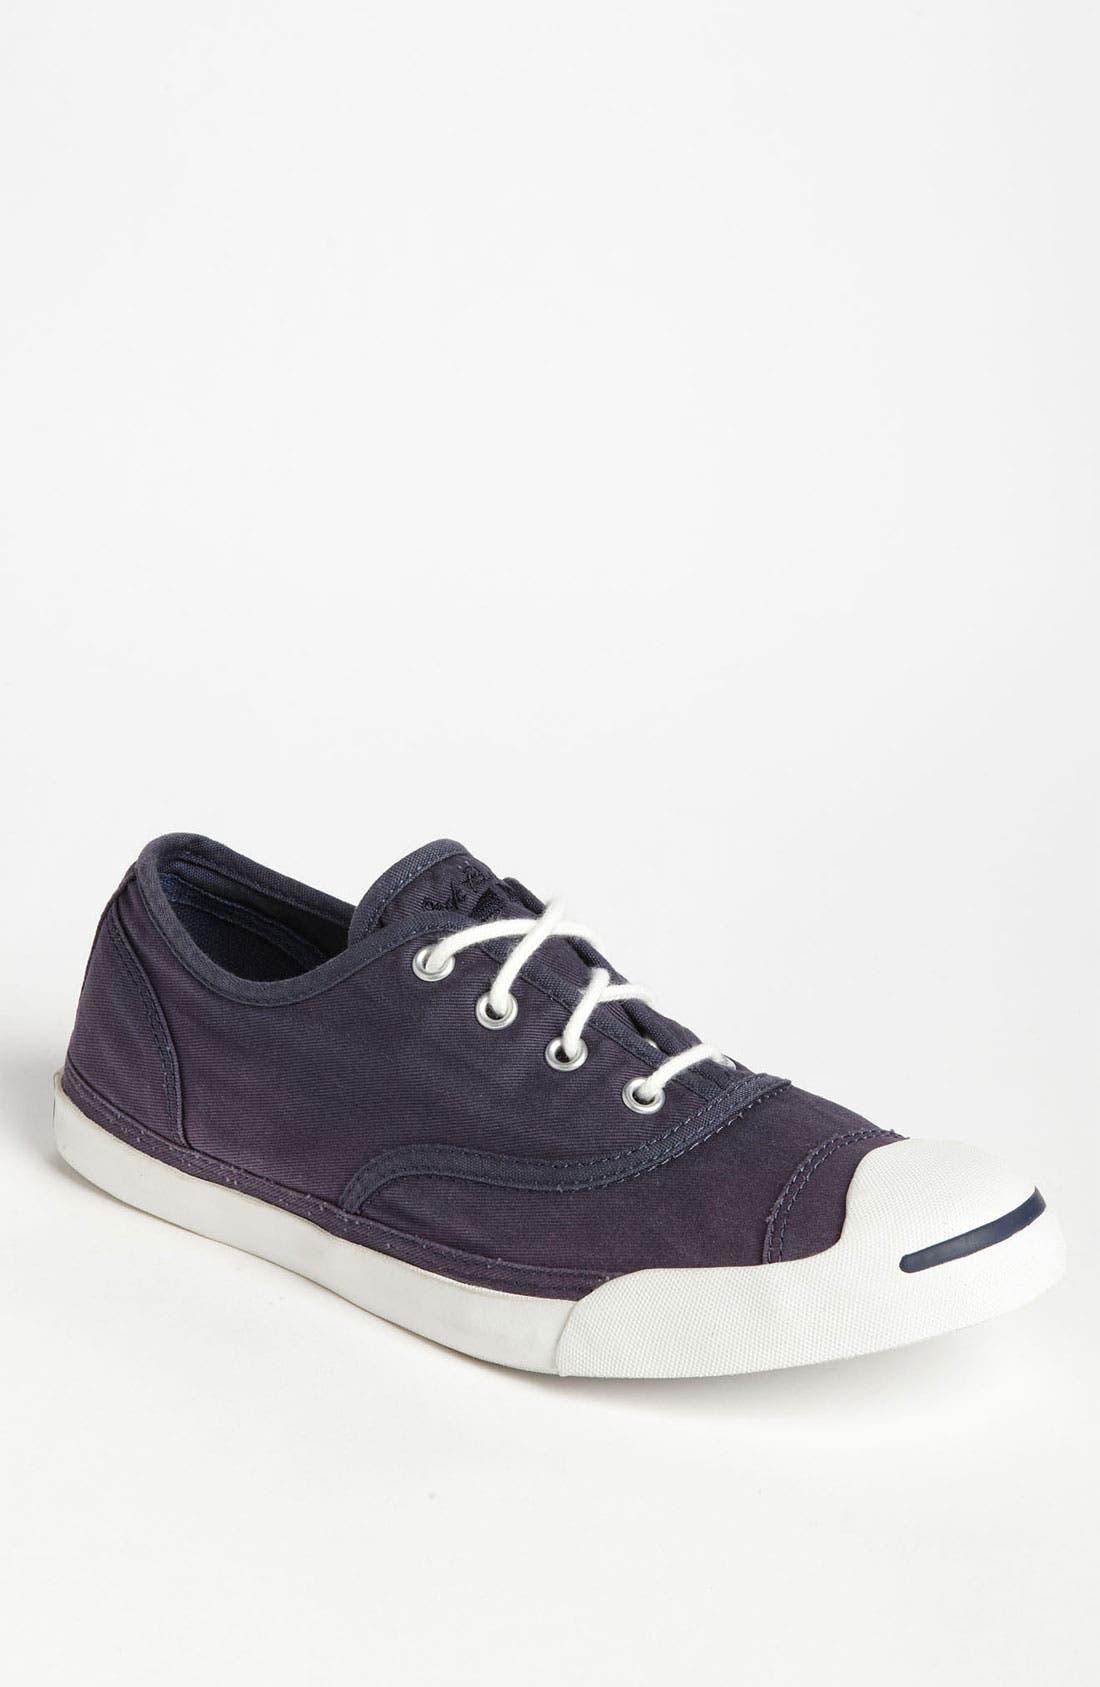 Main Image - Converse 'Jack Purcell CVO LP' Sneaker (Men)